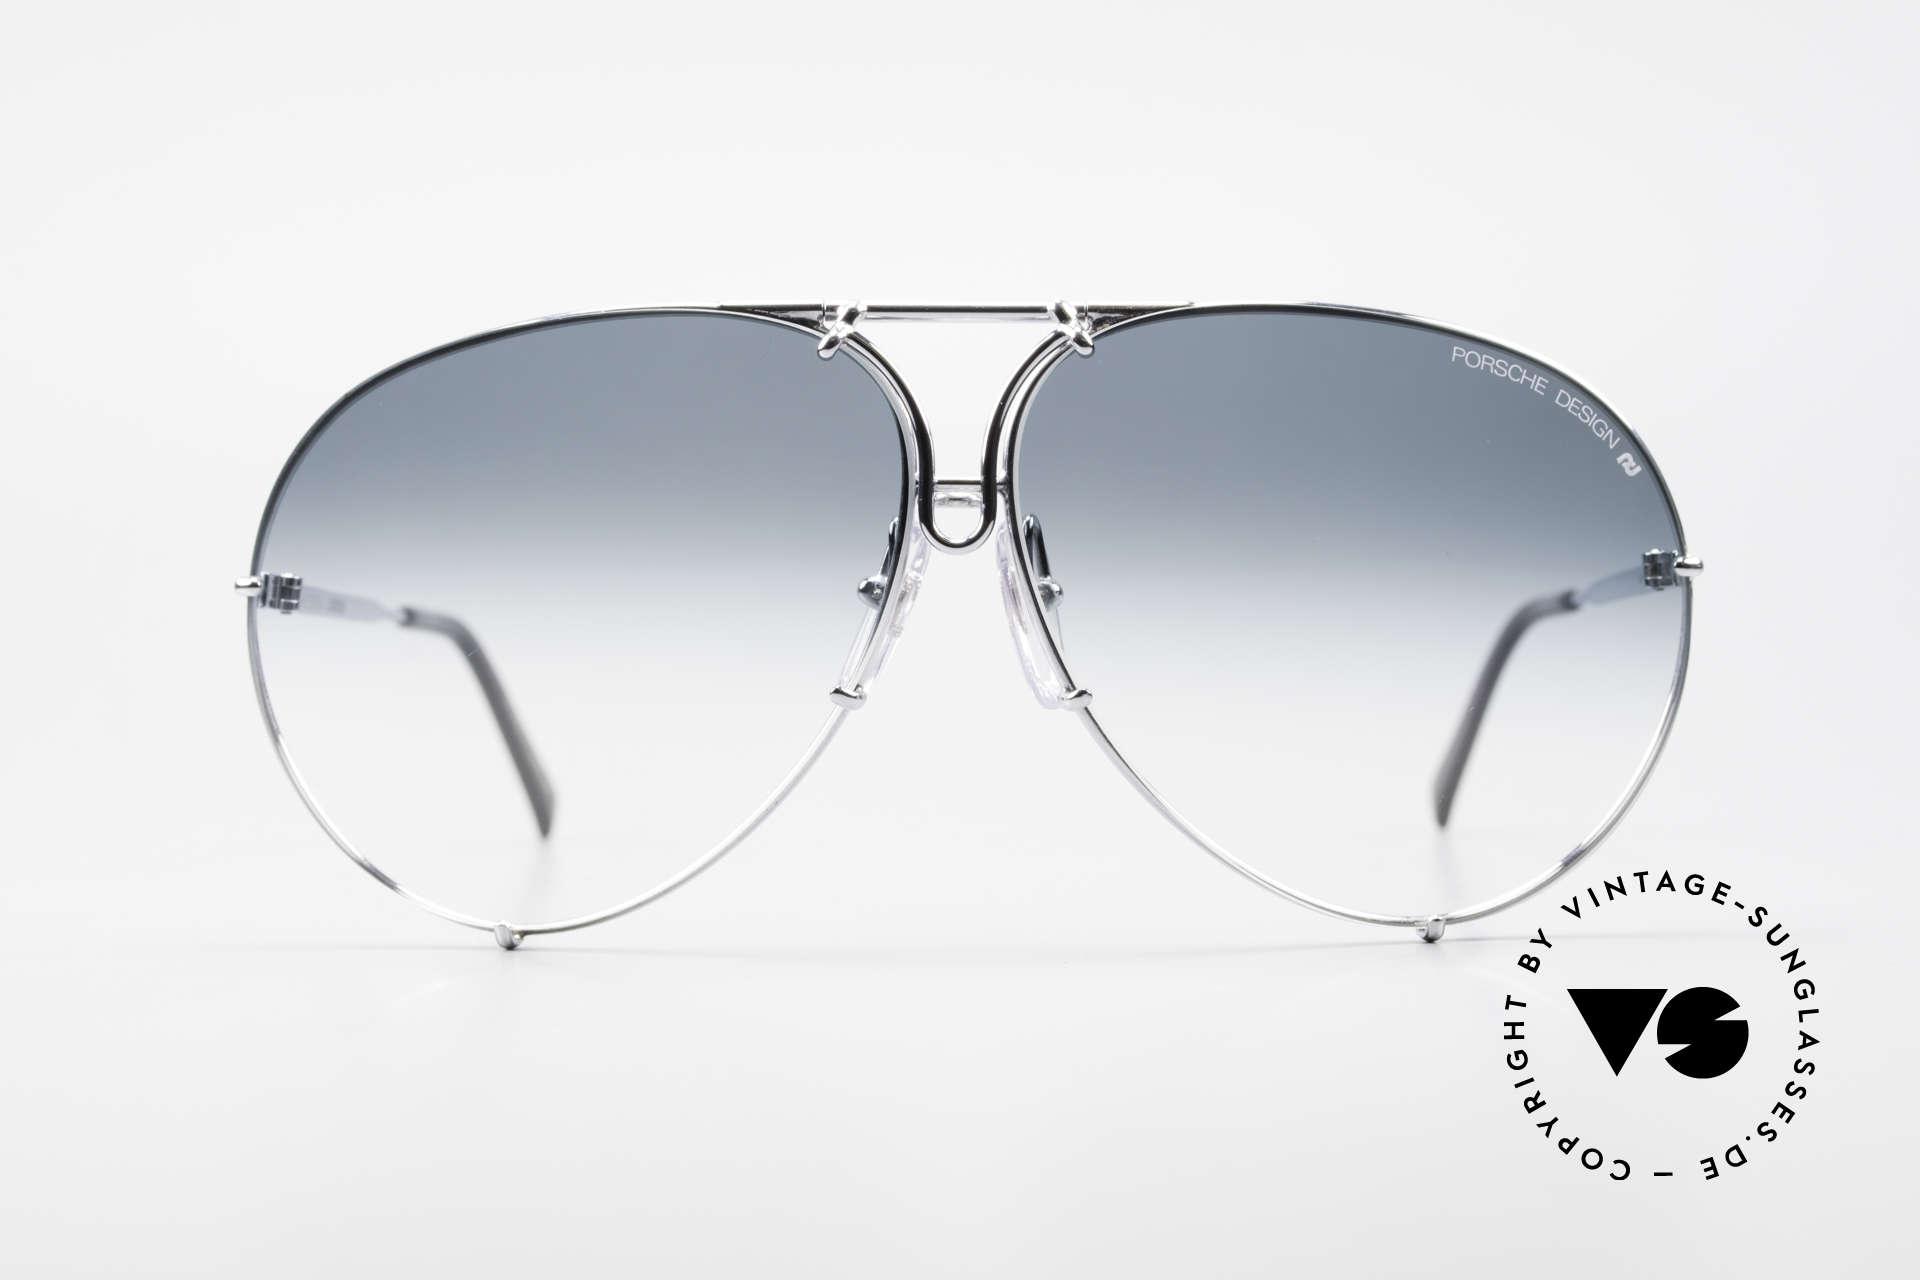 Porsche 5621 80's Aviator XL Sunglasses, vintage Porsche Design by Carrera shades from 1987, Made for Men